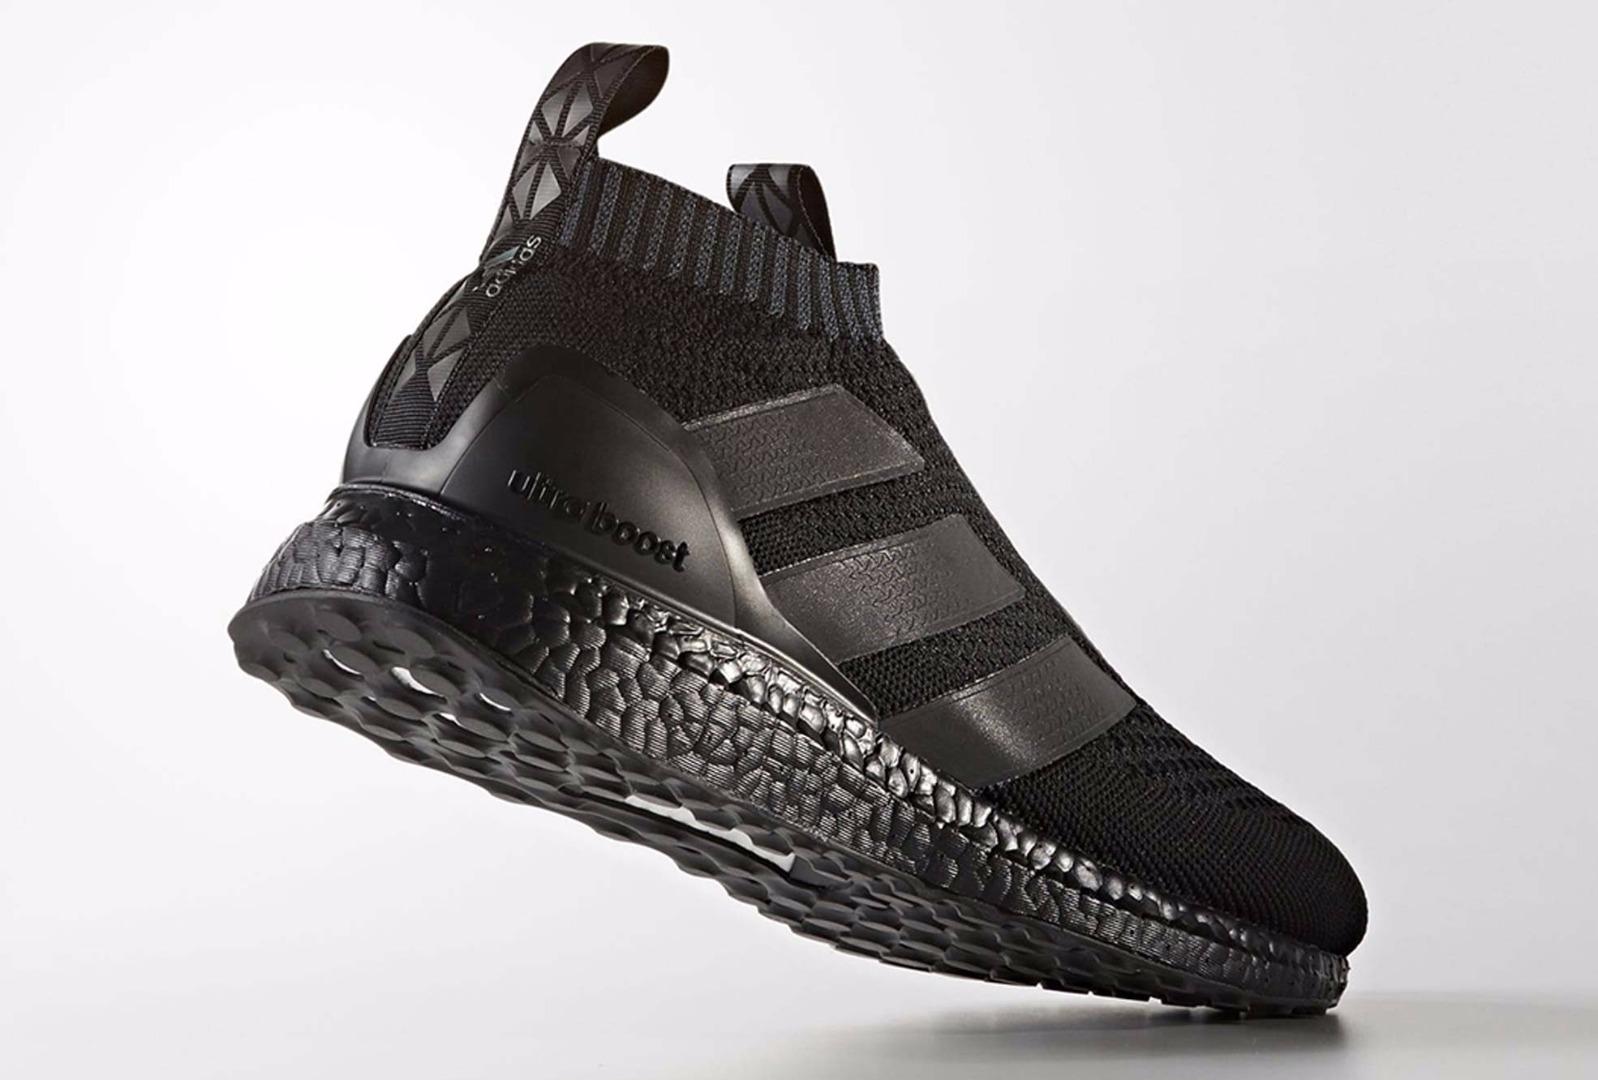 adidas ace 16 shoes